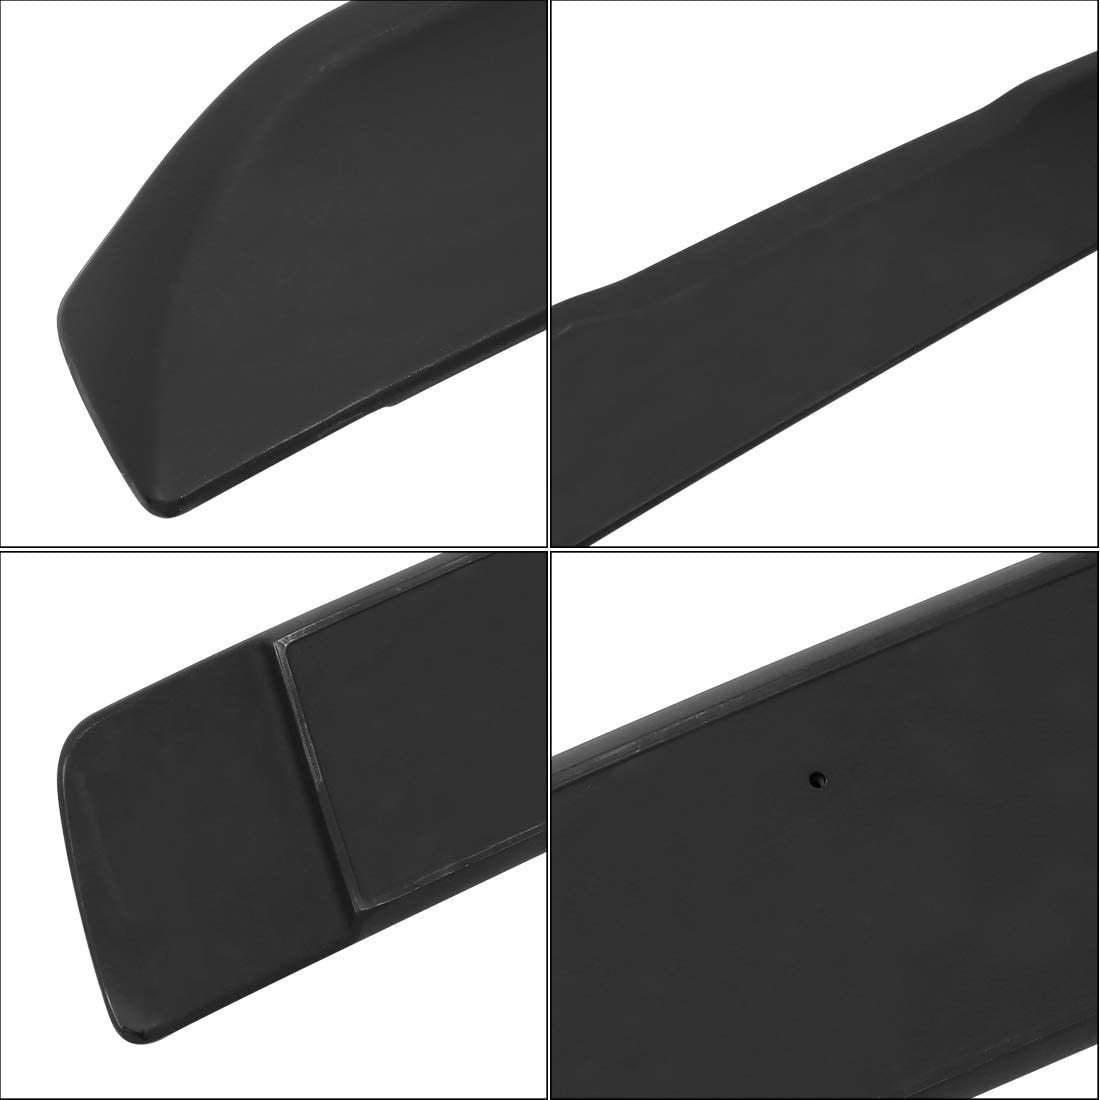 X AUTOHAUX Car Primer Black ABS Rear Trunk Lip Spoiler Wing for Dodge Challenger 2008-2018